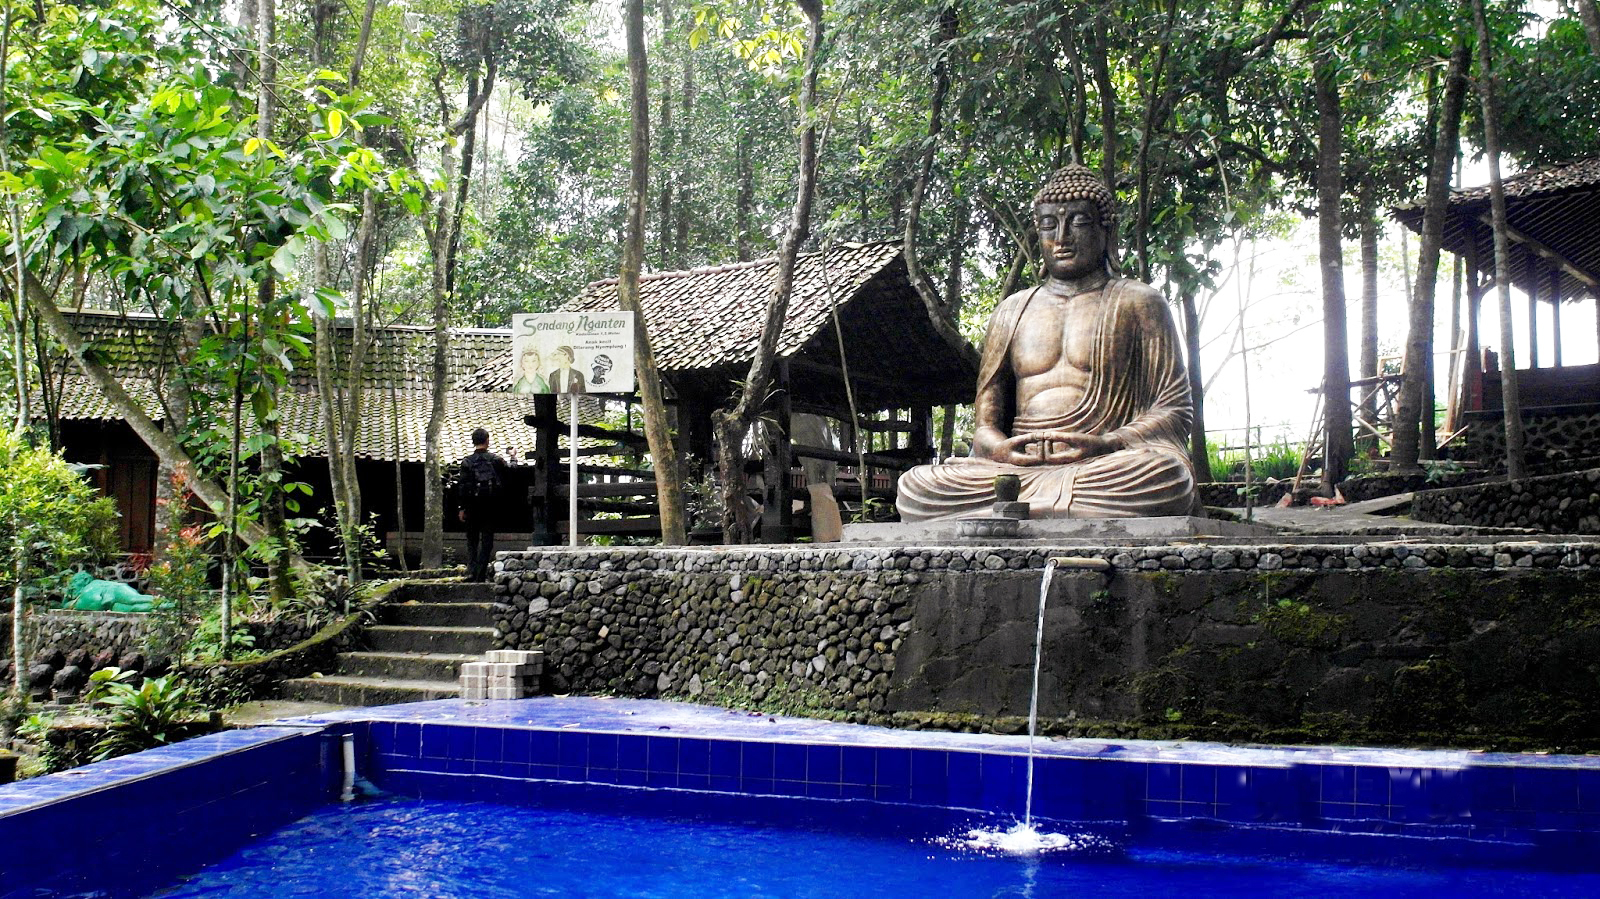 wisata edukasi di Jogja Omah Petruk manis murah dan unik